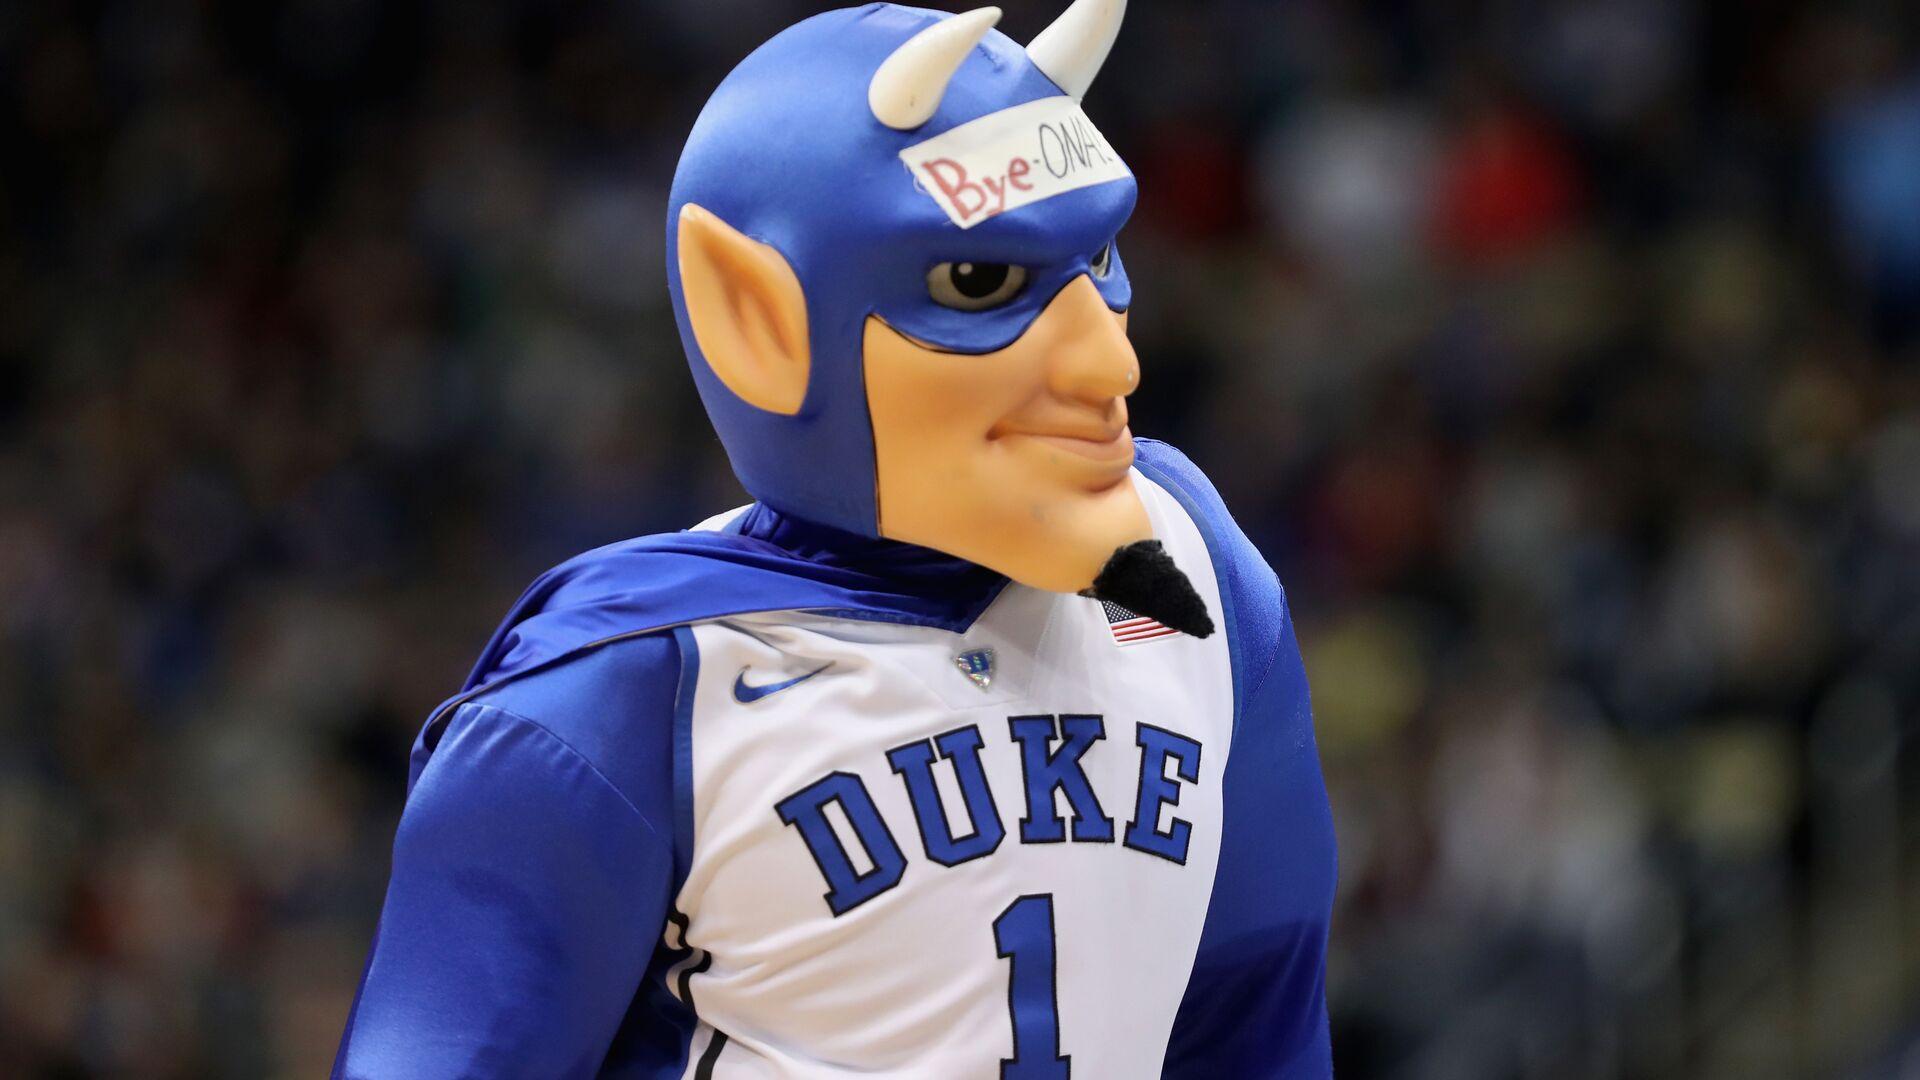 Duke basketball signee struggles to shake off rust in return